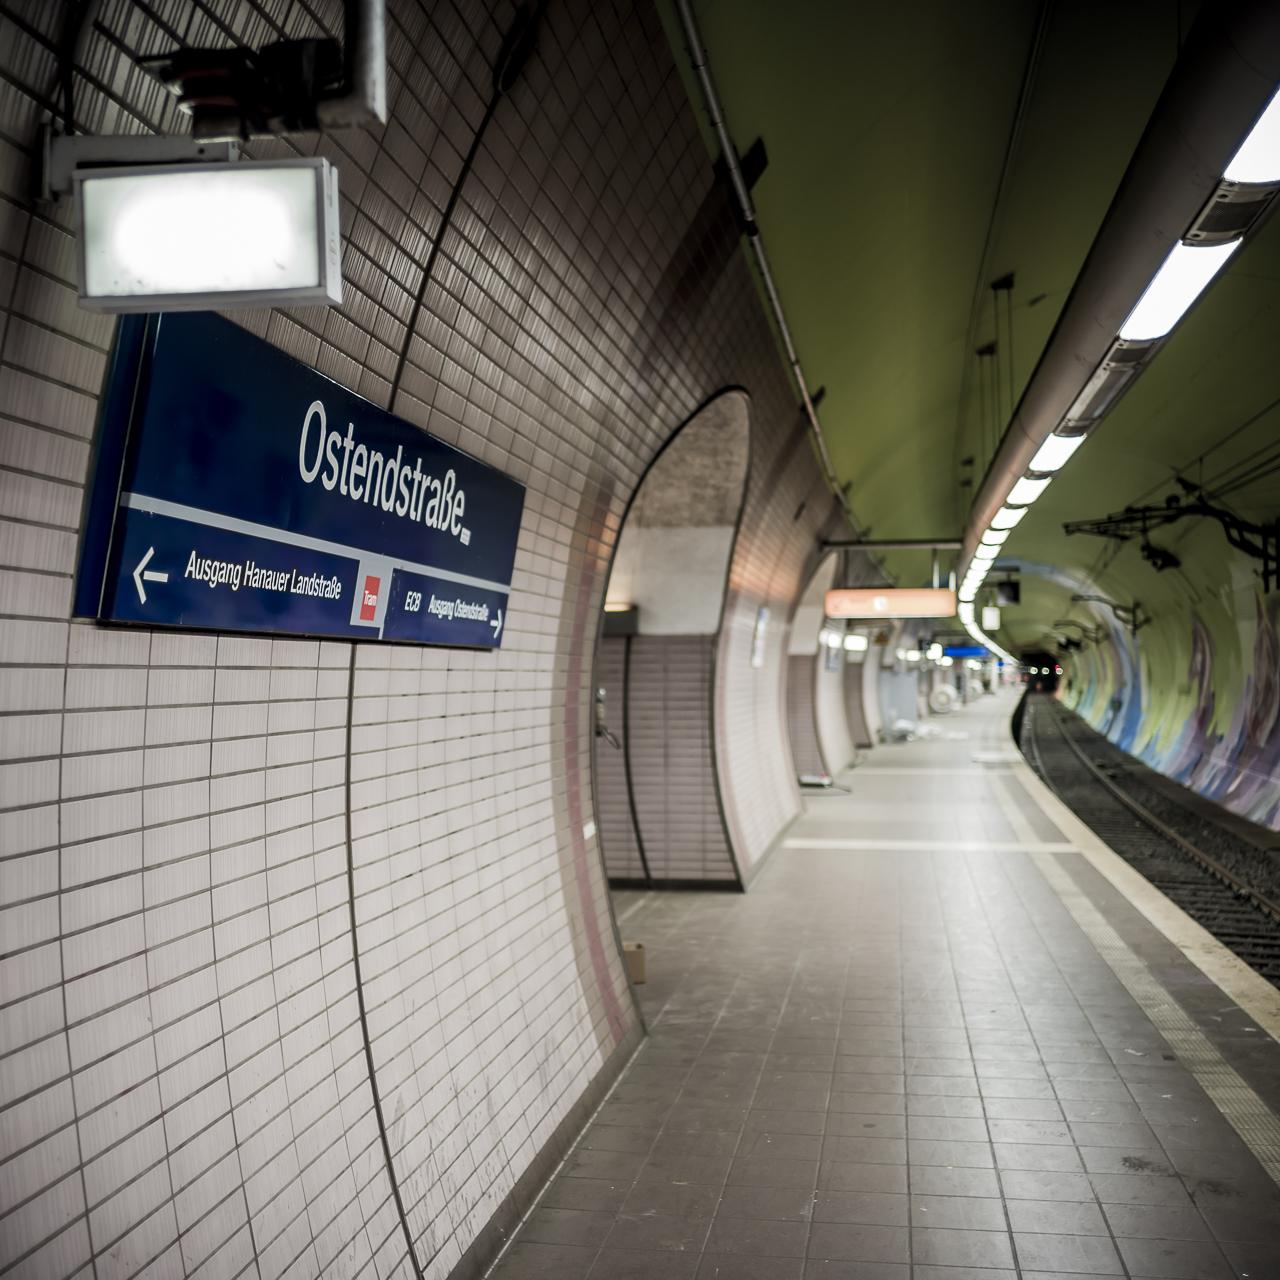 A work by Does - Ostendstrasse frankfurt germany tunnel rudi 1